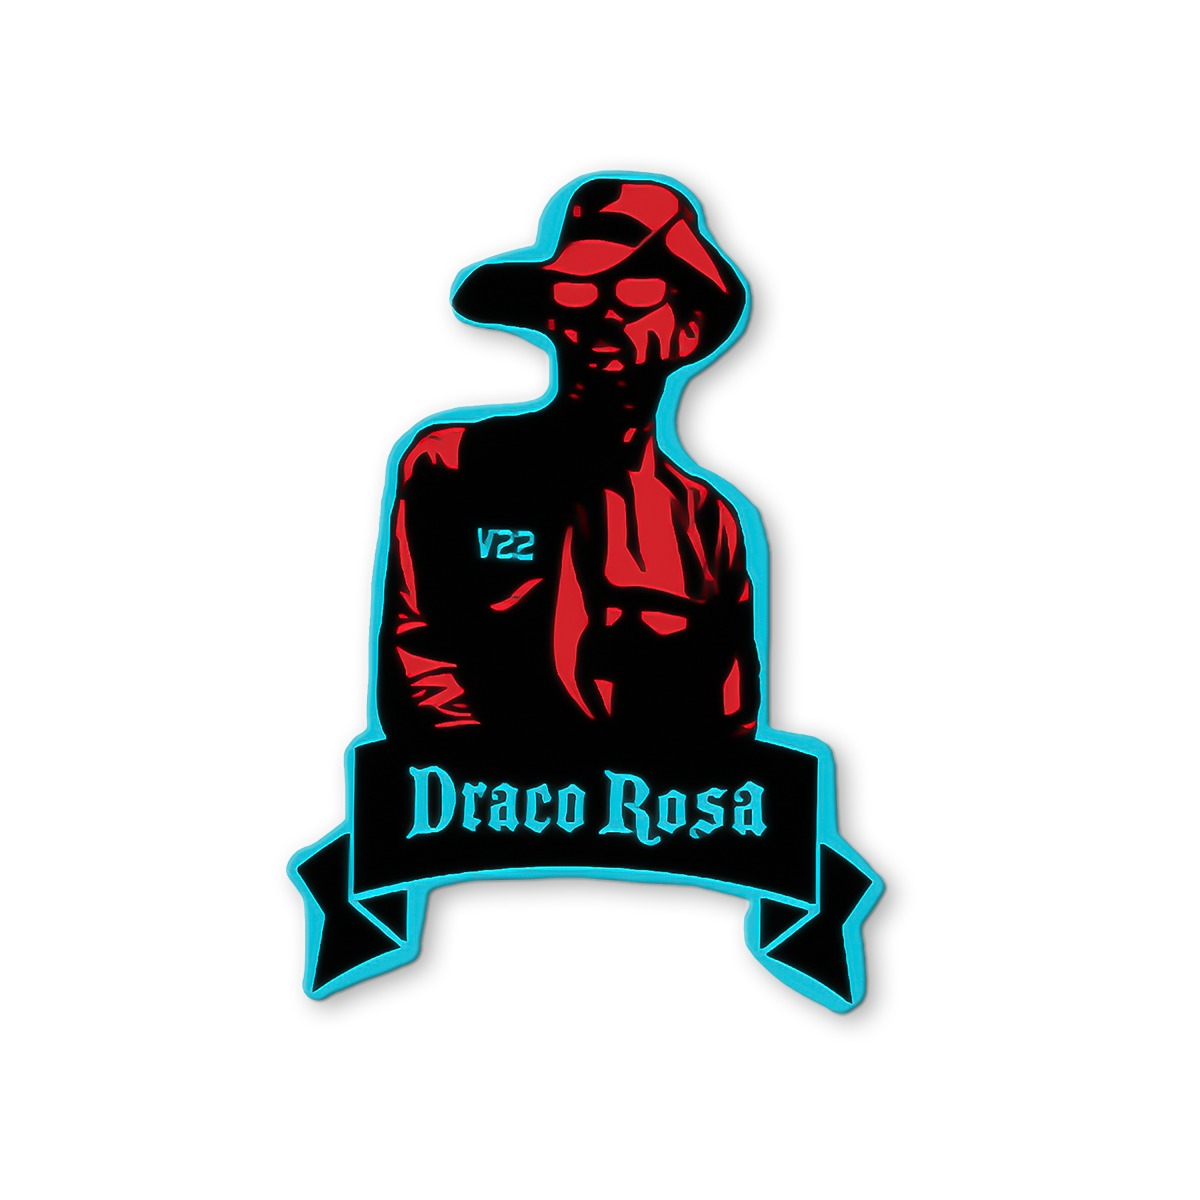 Draco Rosa Vagabundo 22 Pin